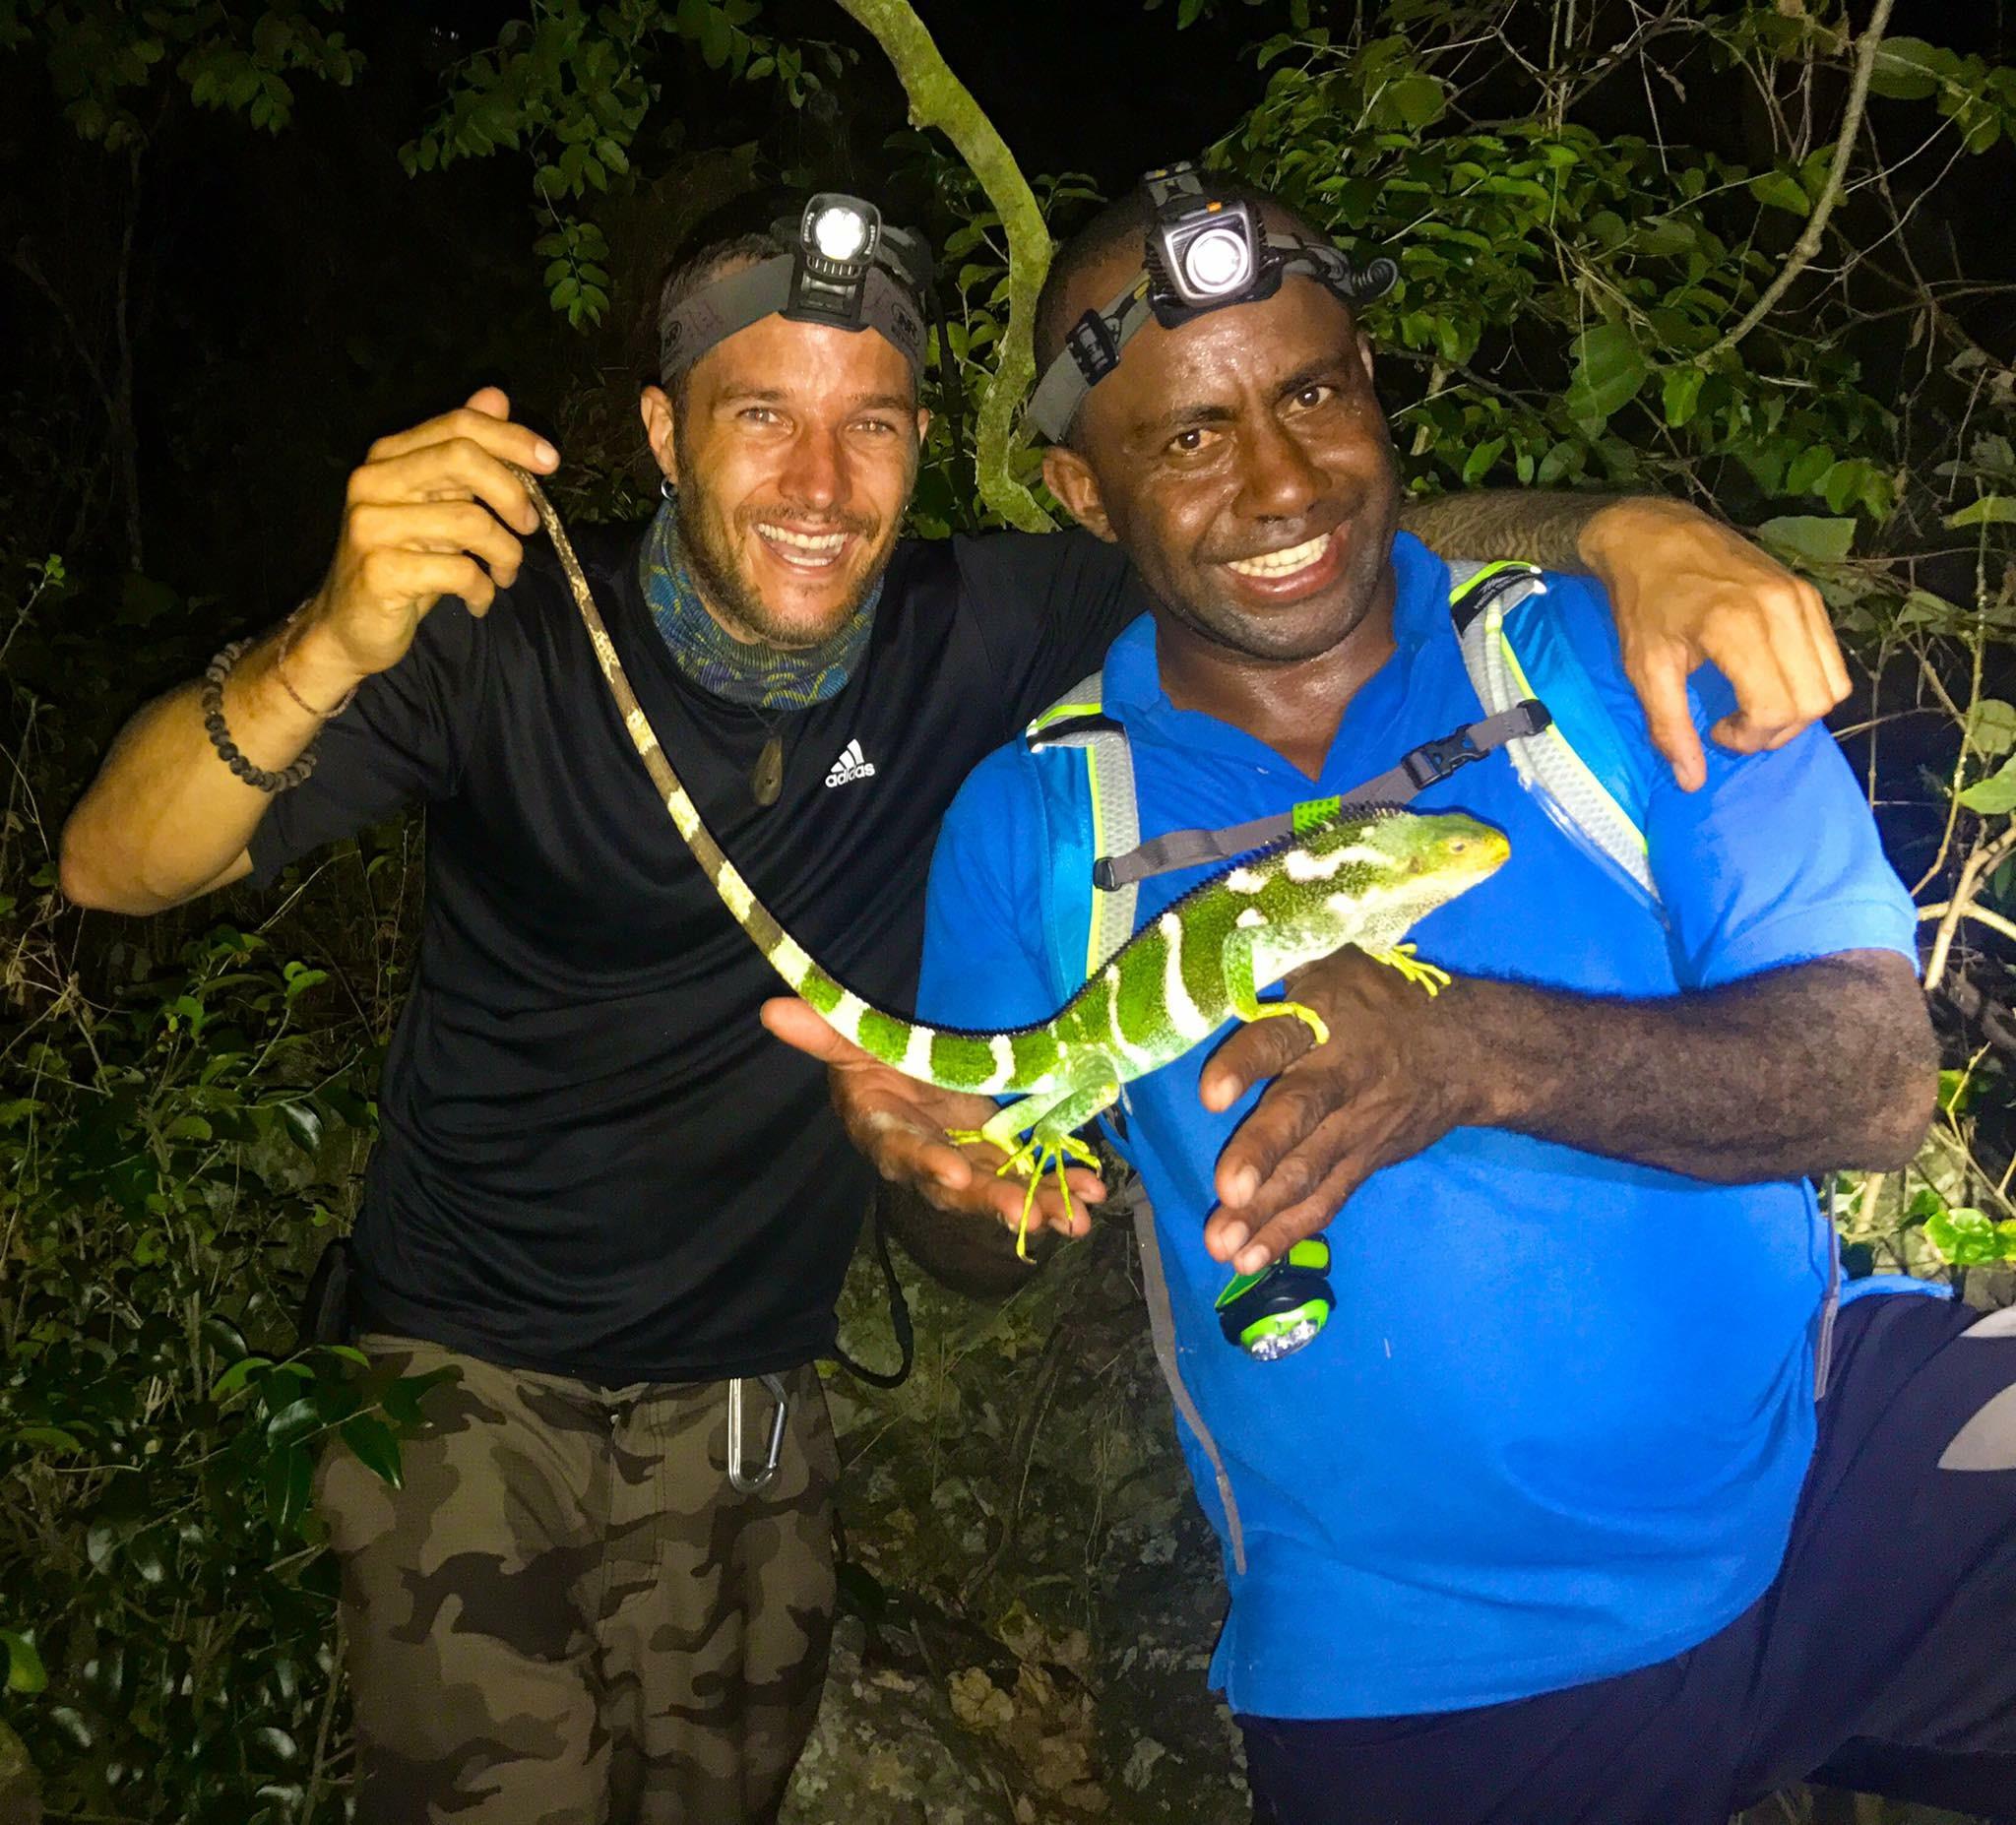 Joey and Jhaba, his field partner and Iguana Ranger for Monuriki Island.